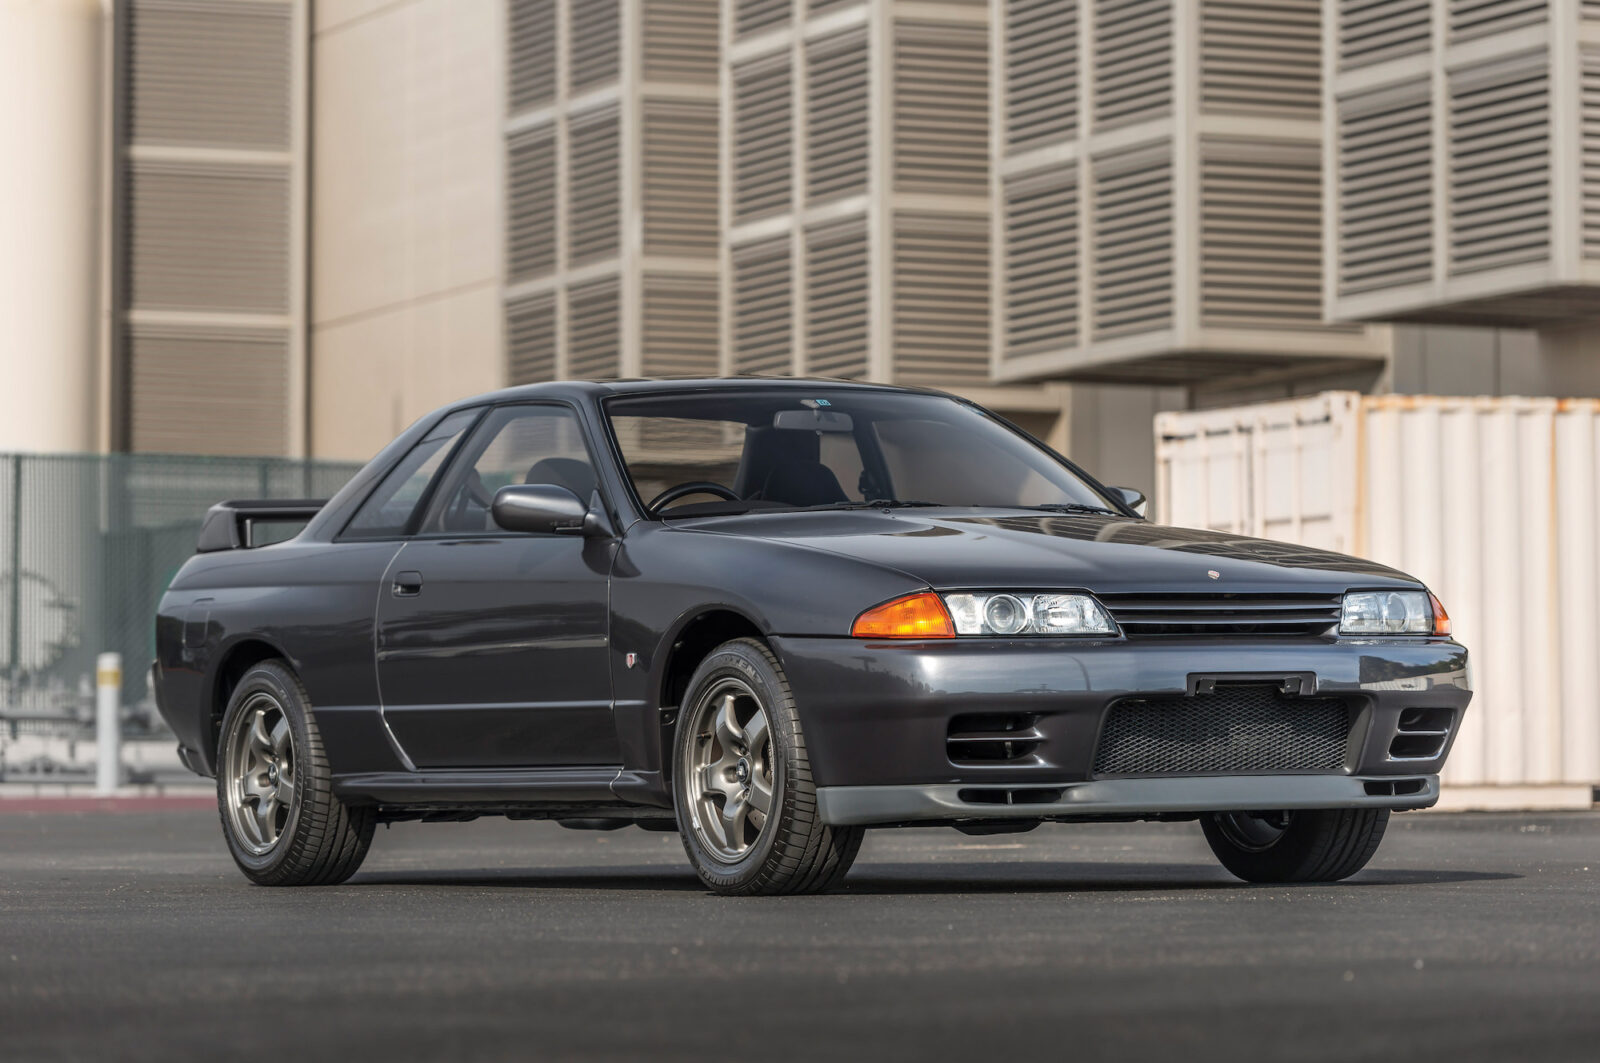 Nissan Skyline GT R 1600x1063 - 1989 Nissan Skyline GT-R